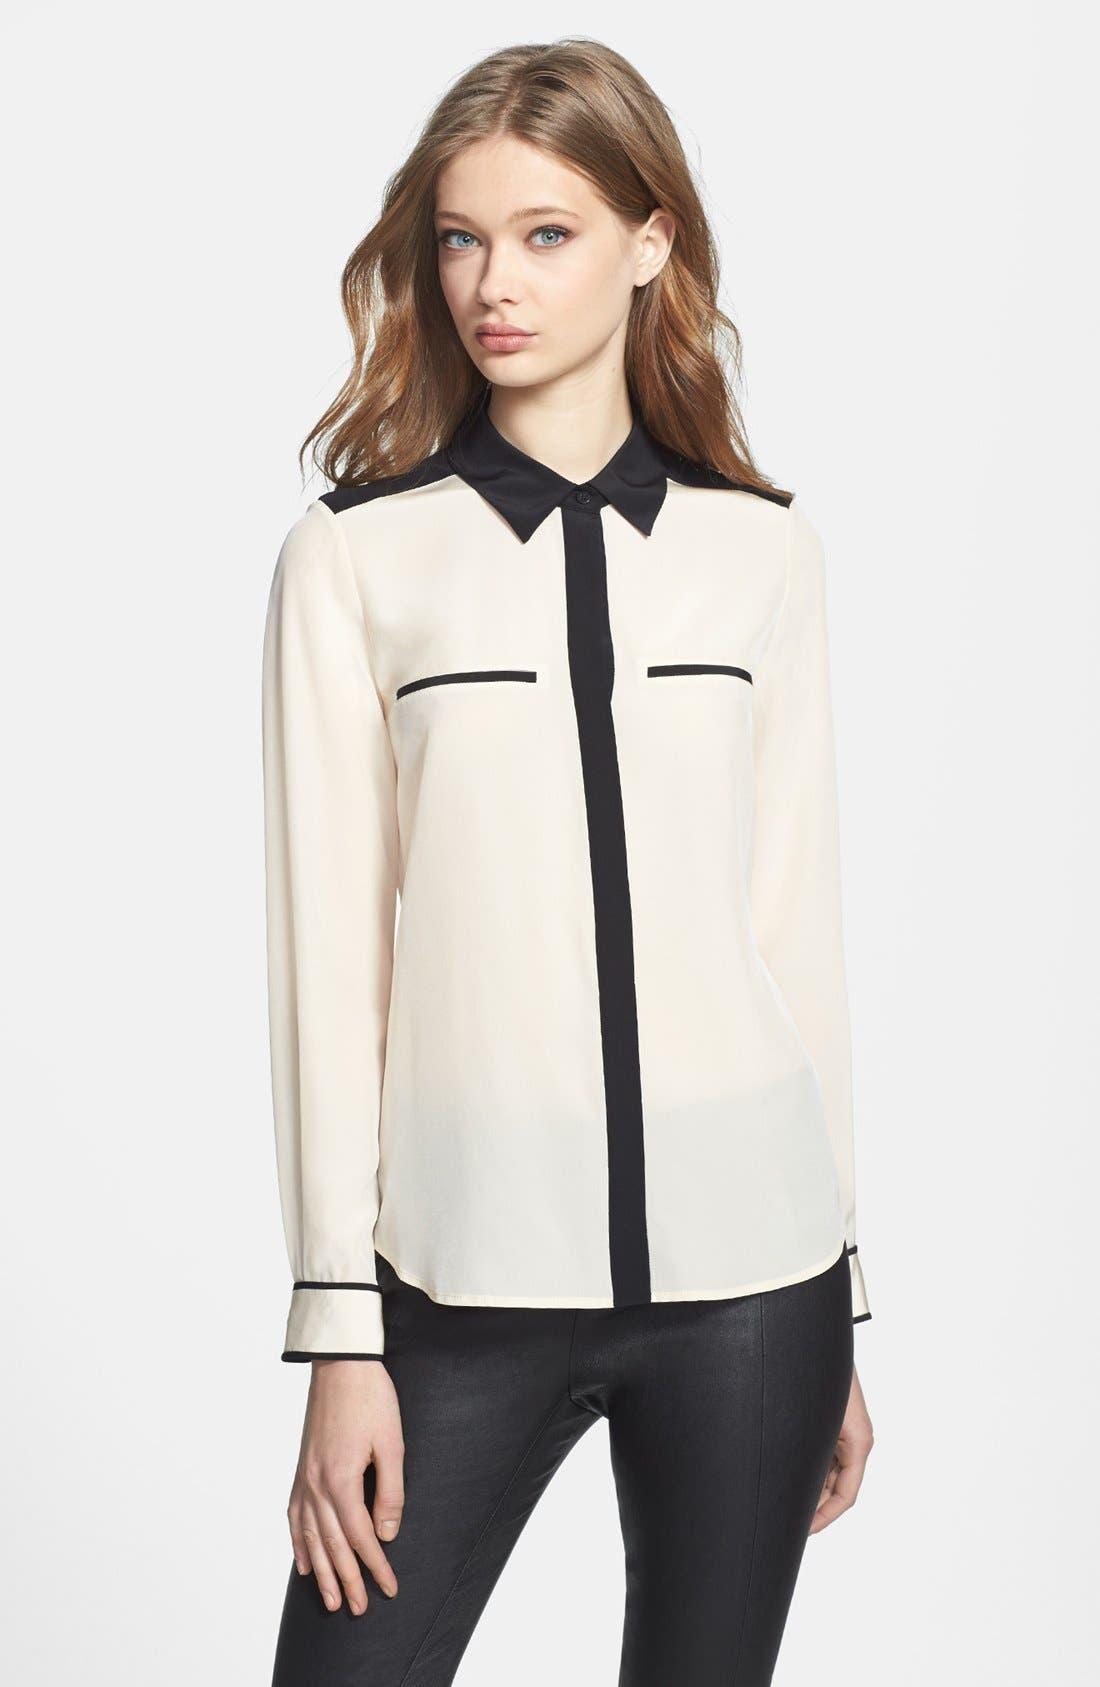 Alternate Image 1 Selected - Diane von Furstenberg 'Marah' Colorblock Silk Blouse